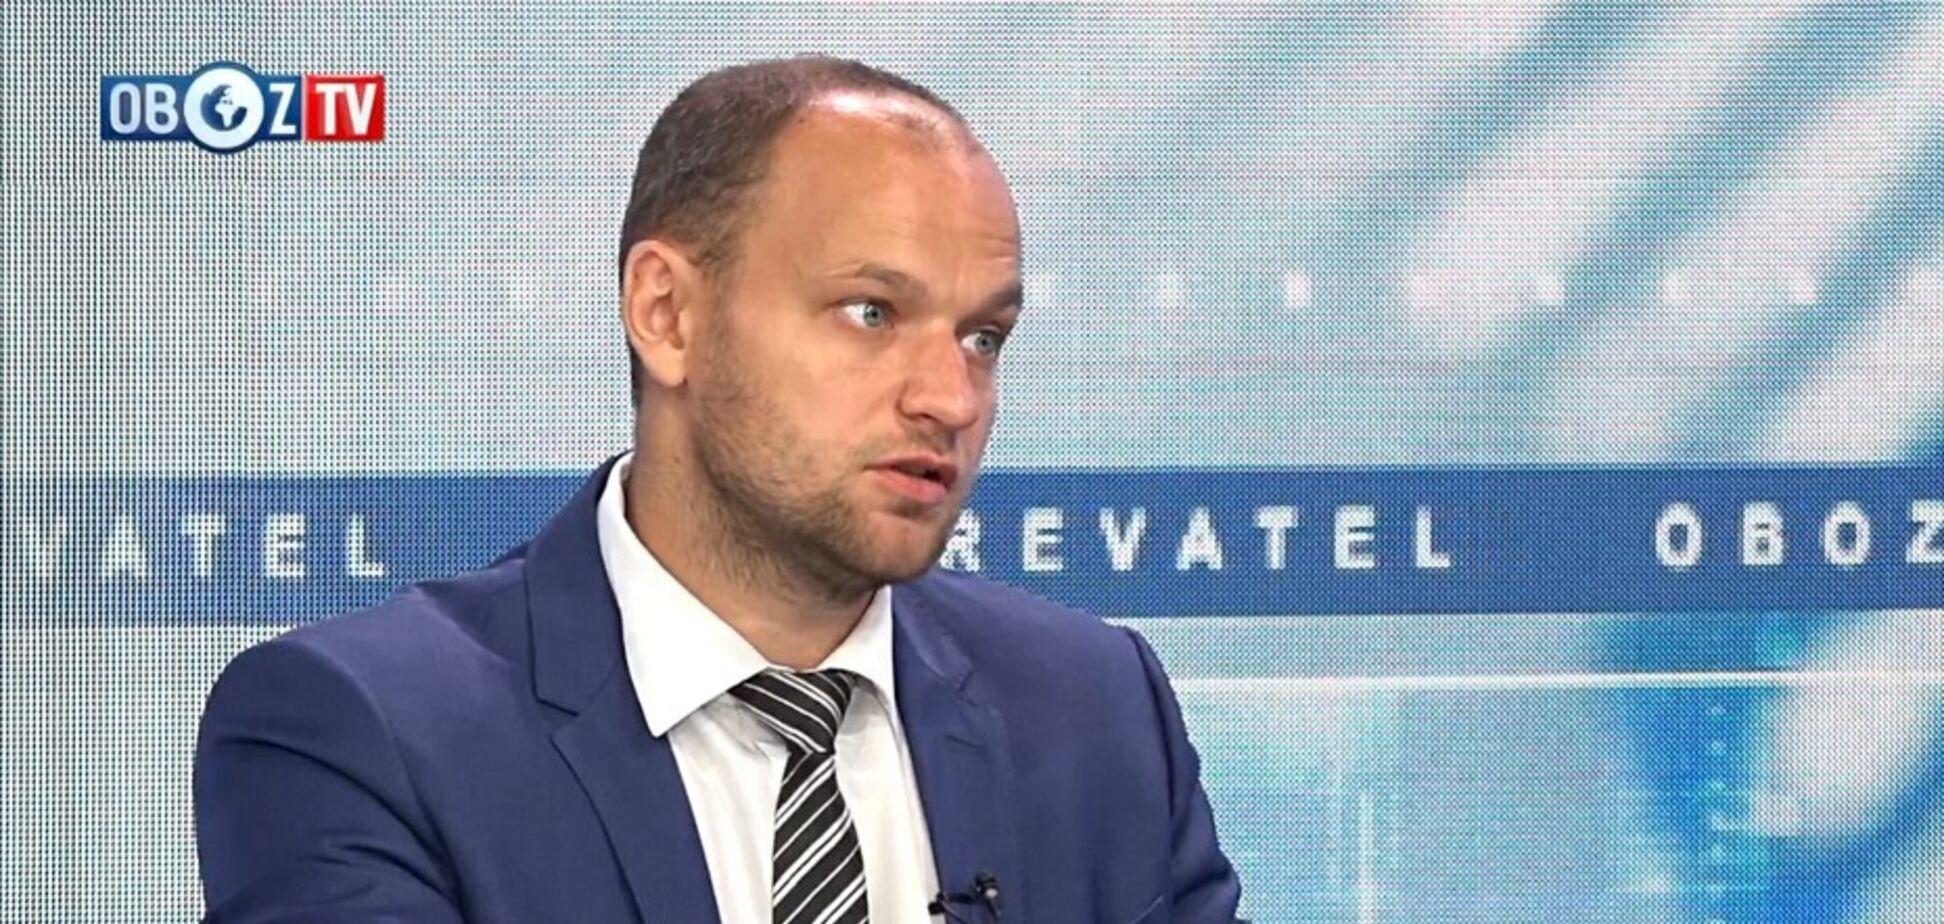 Юрист дав прогнози щодо справи Януковича